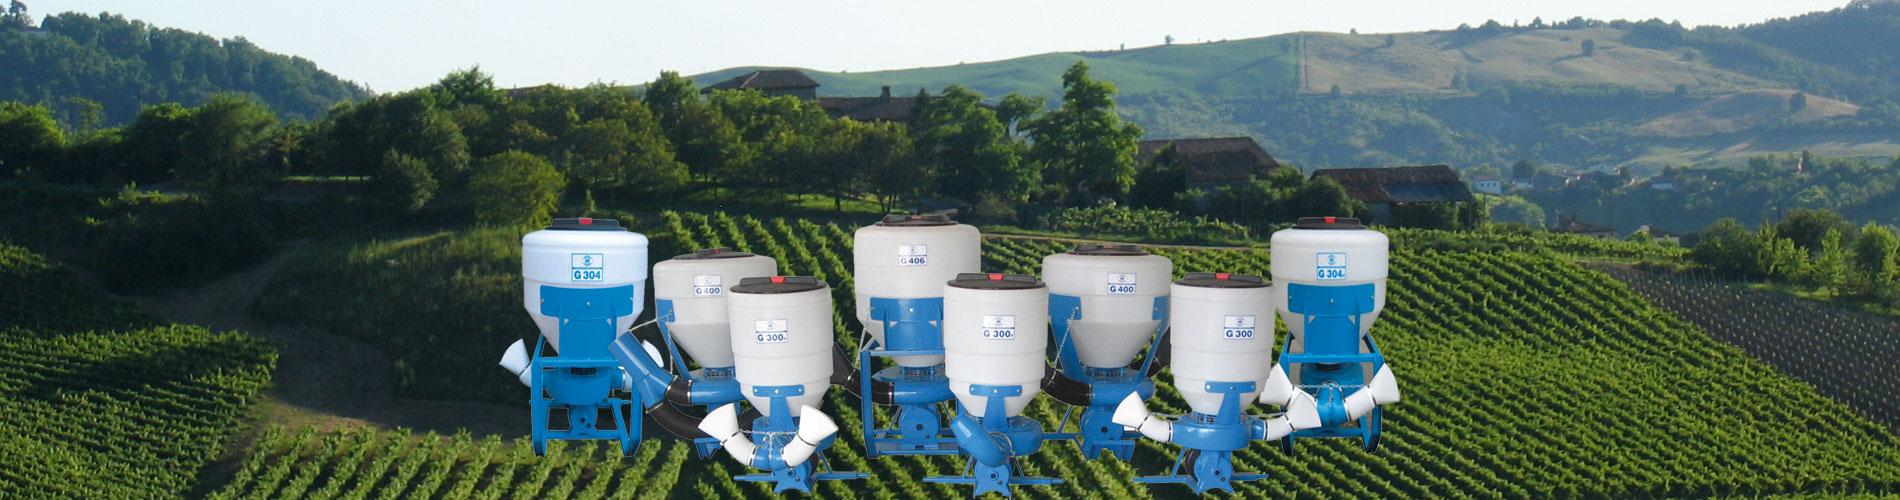 MB Bergonzi - Impolveratori per l'agricoltura